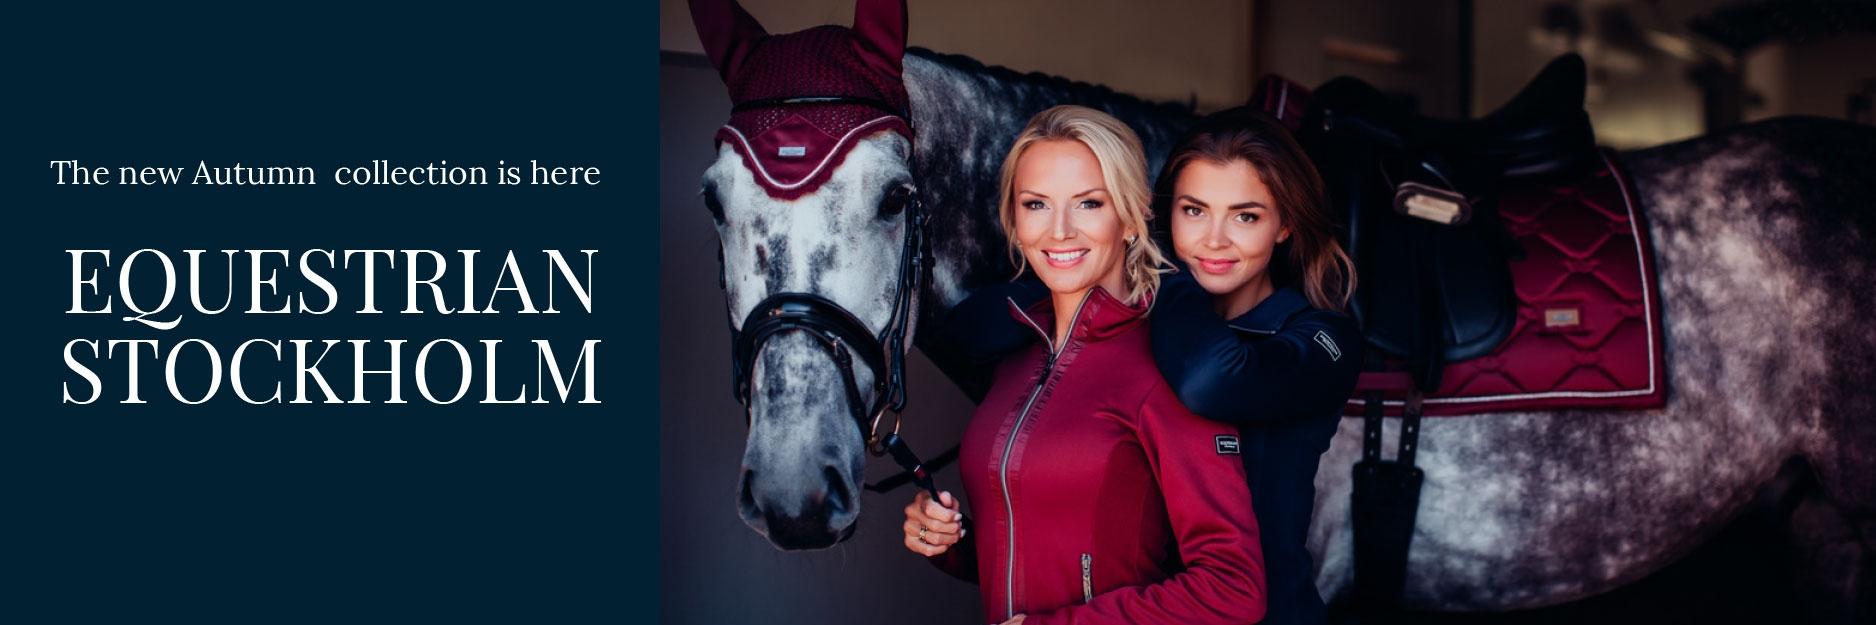 Equestrian Stockholm